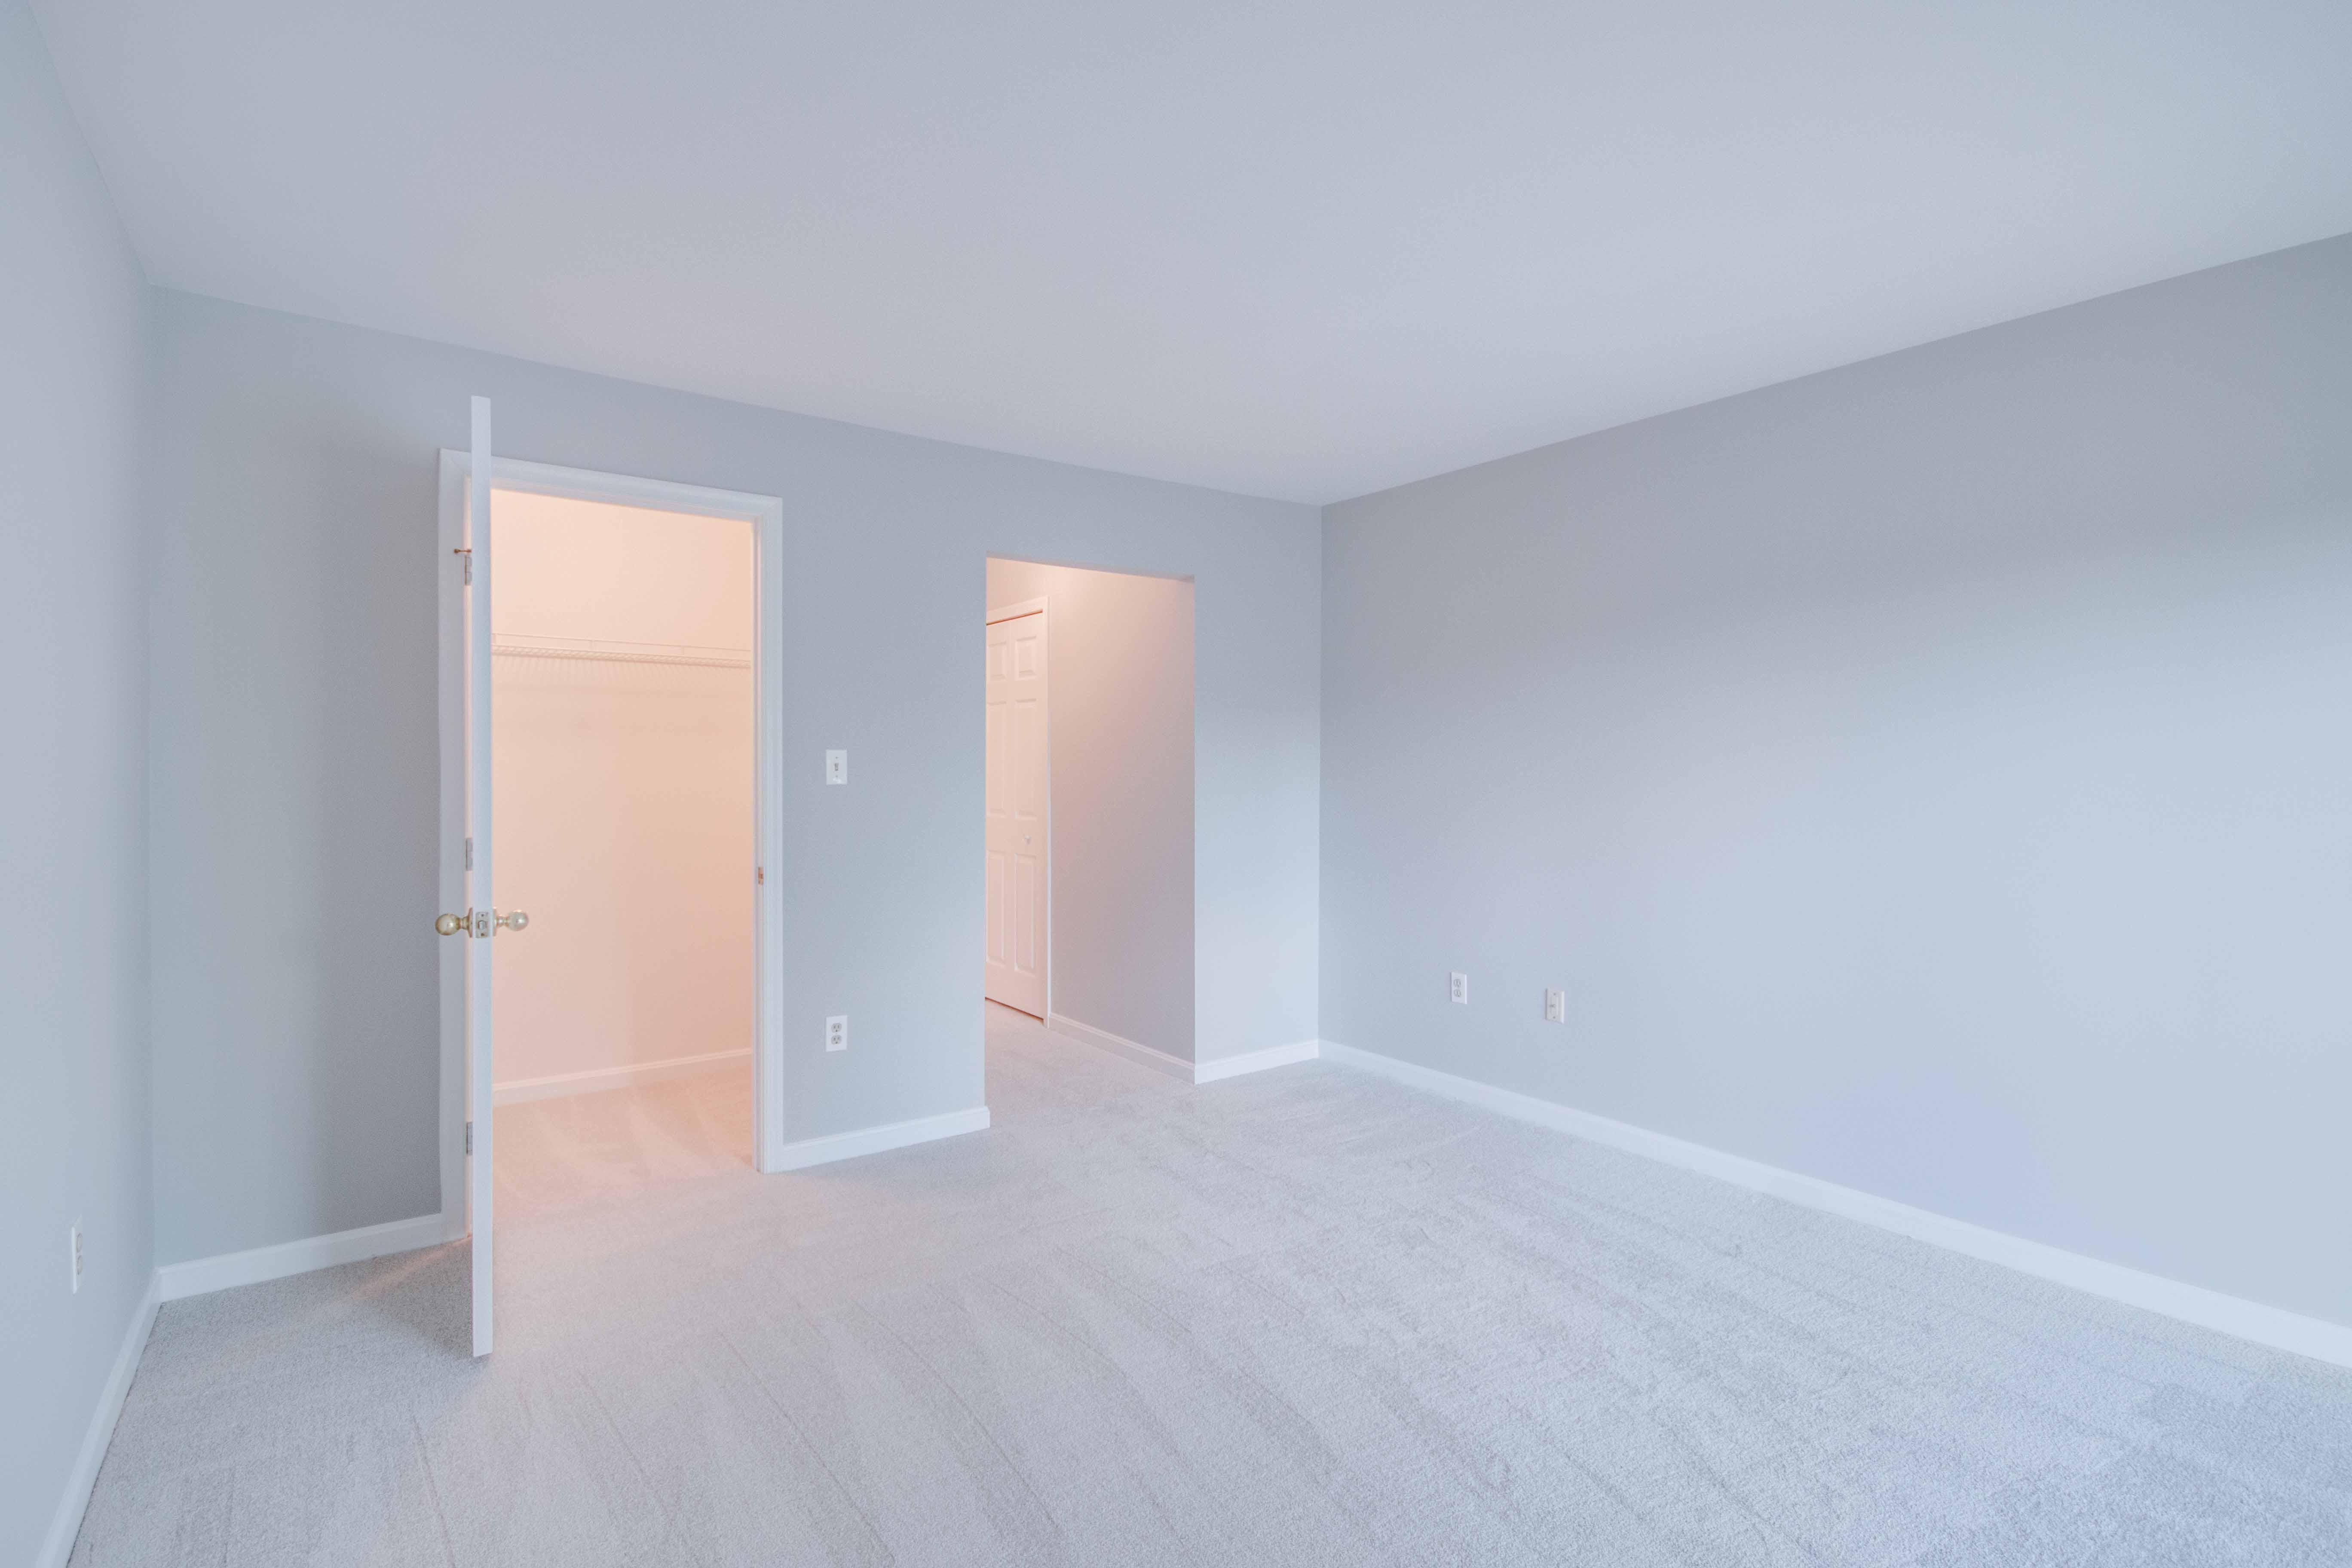 20576 Snowshoe Square #201, Ashburn, VA -  Master Bedroom